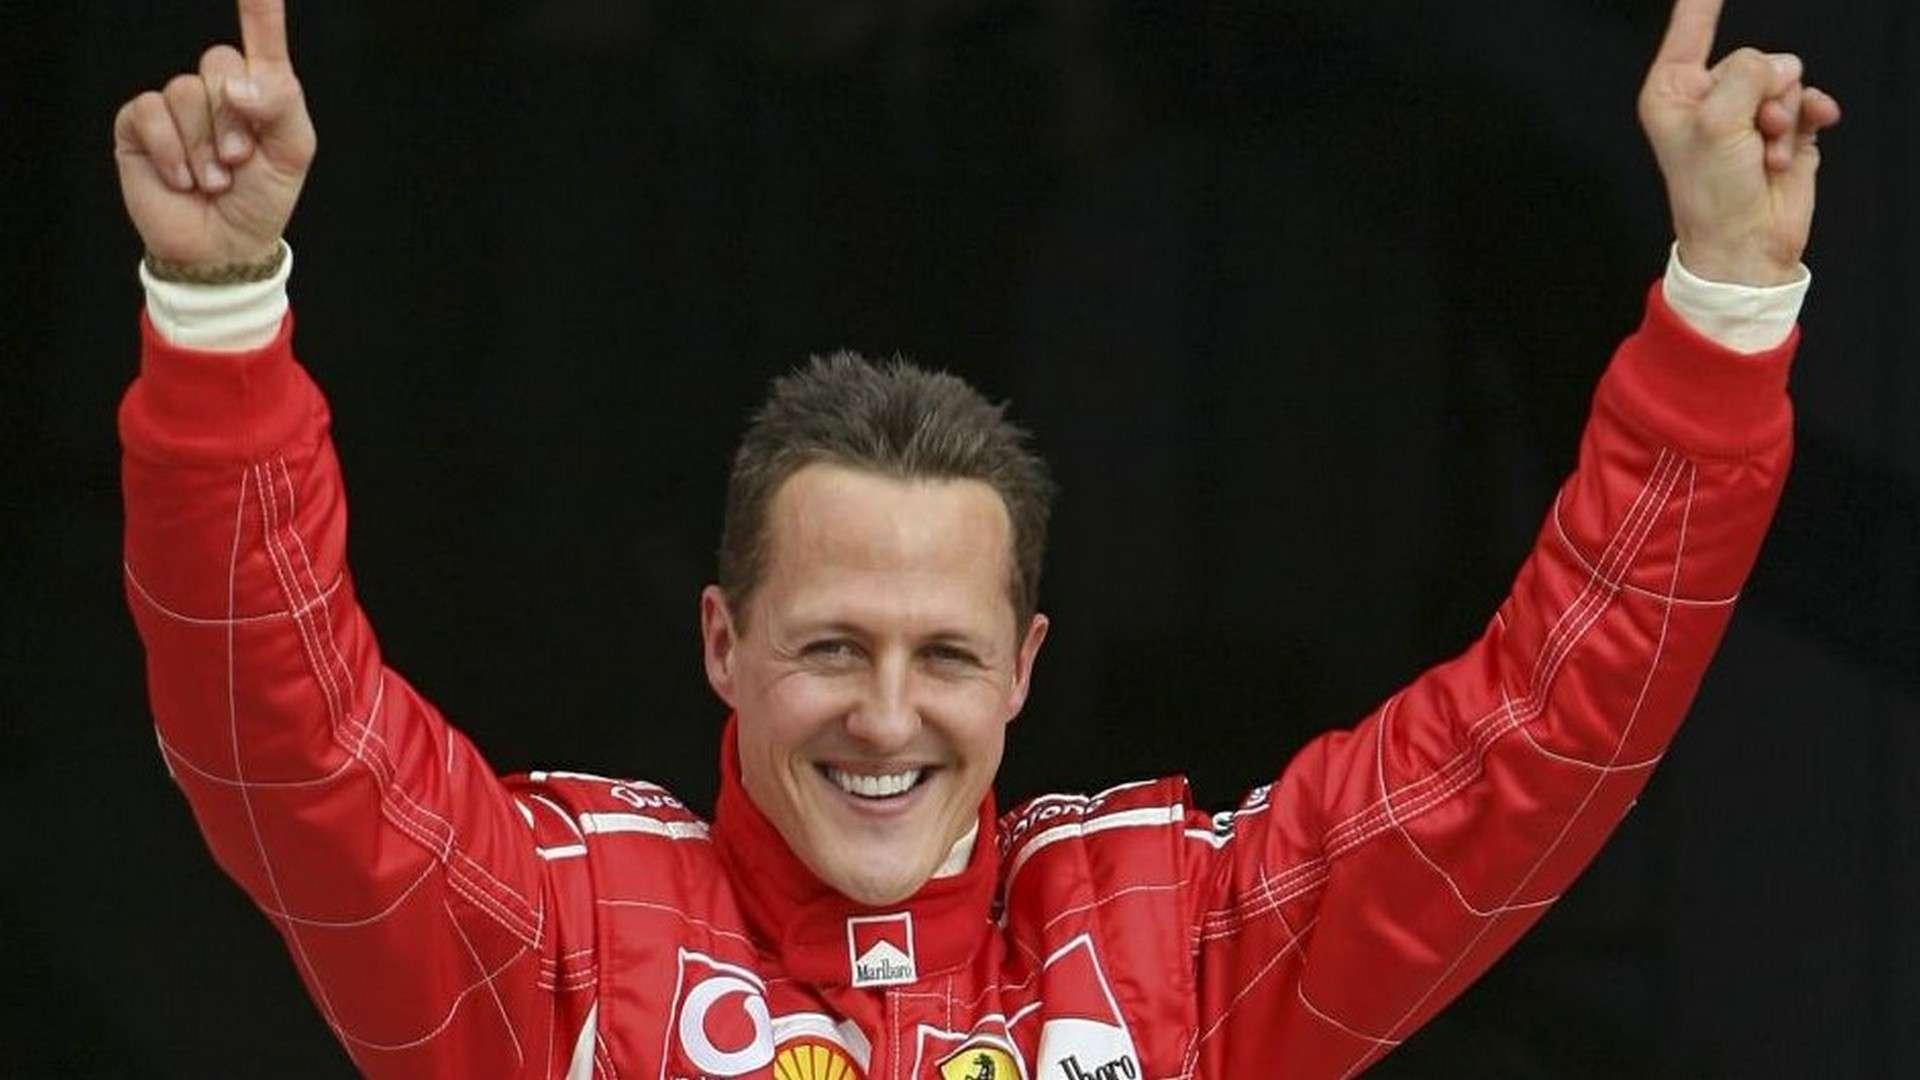 Michael Schumacher ganó un total de 7 campeonatos mundiales